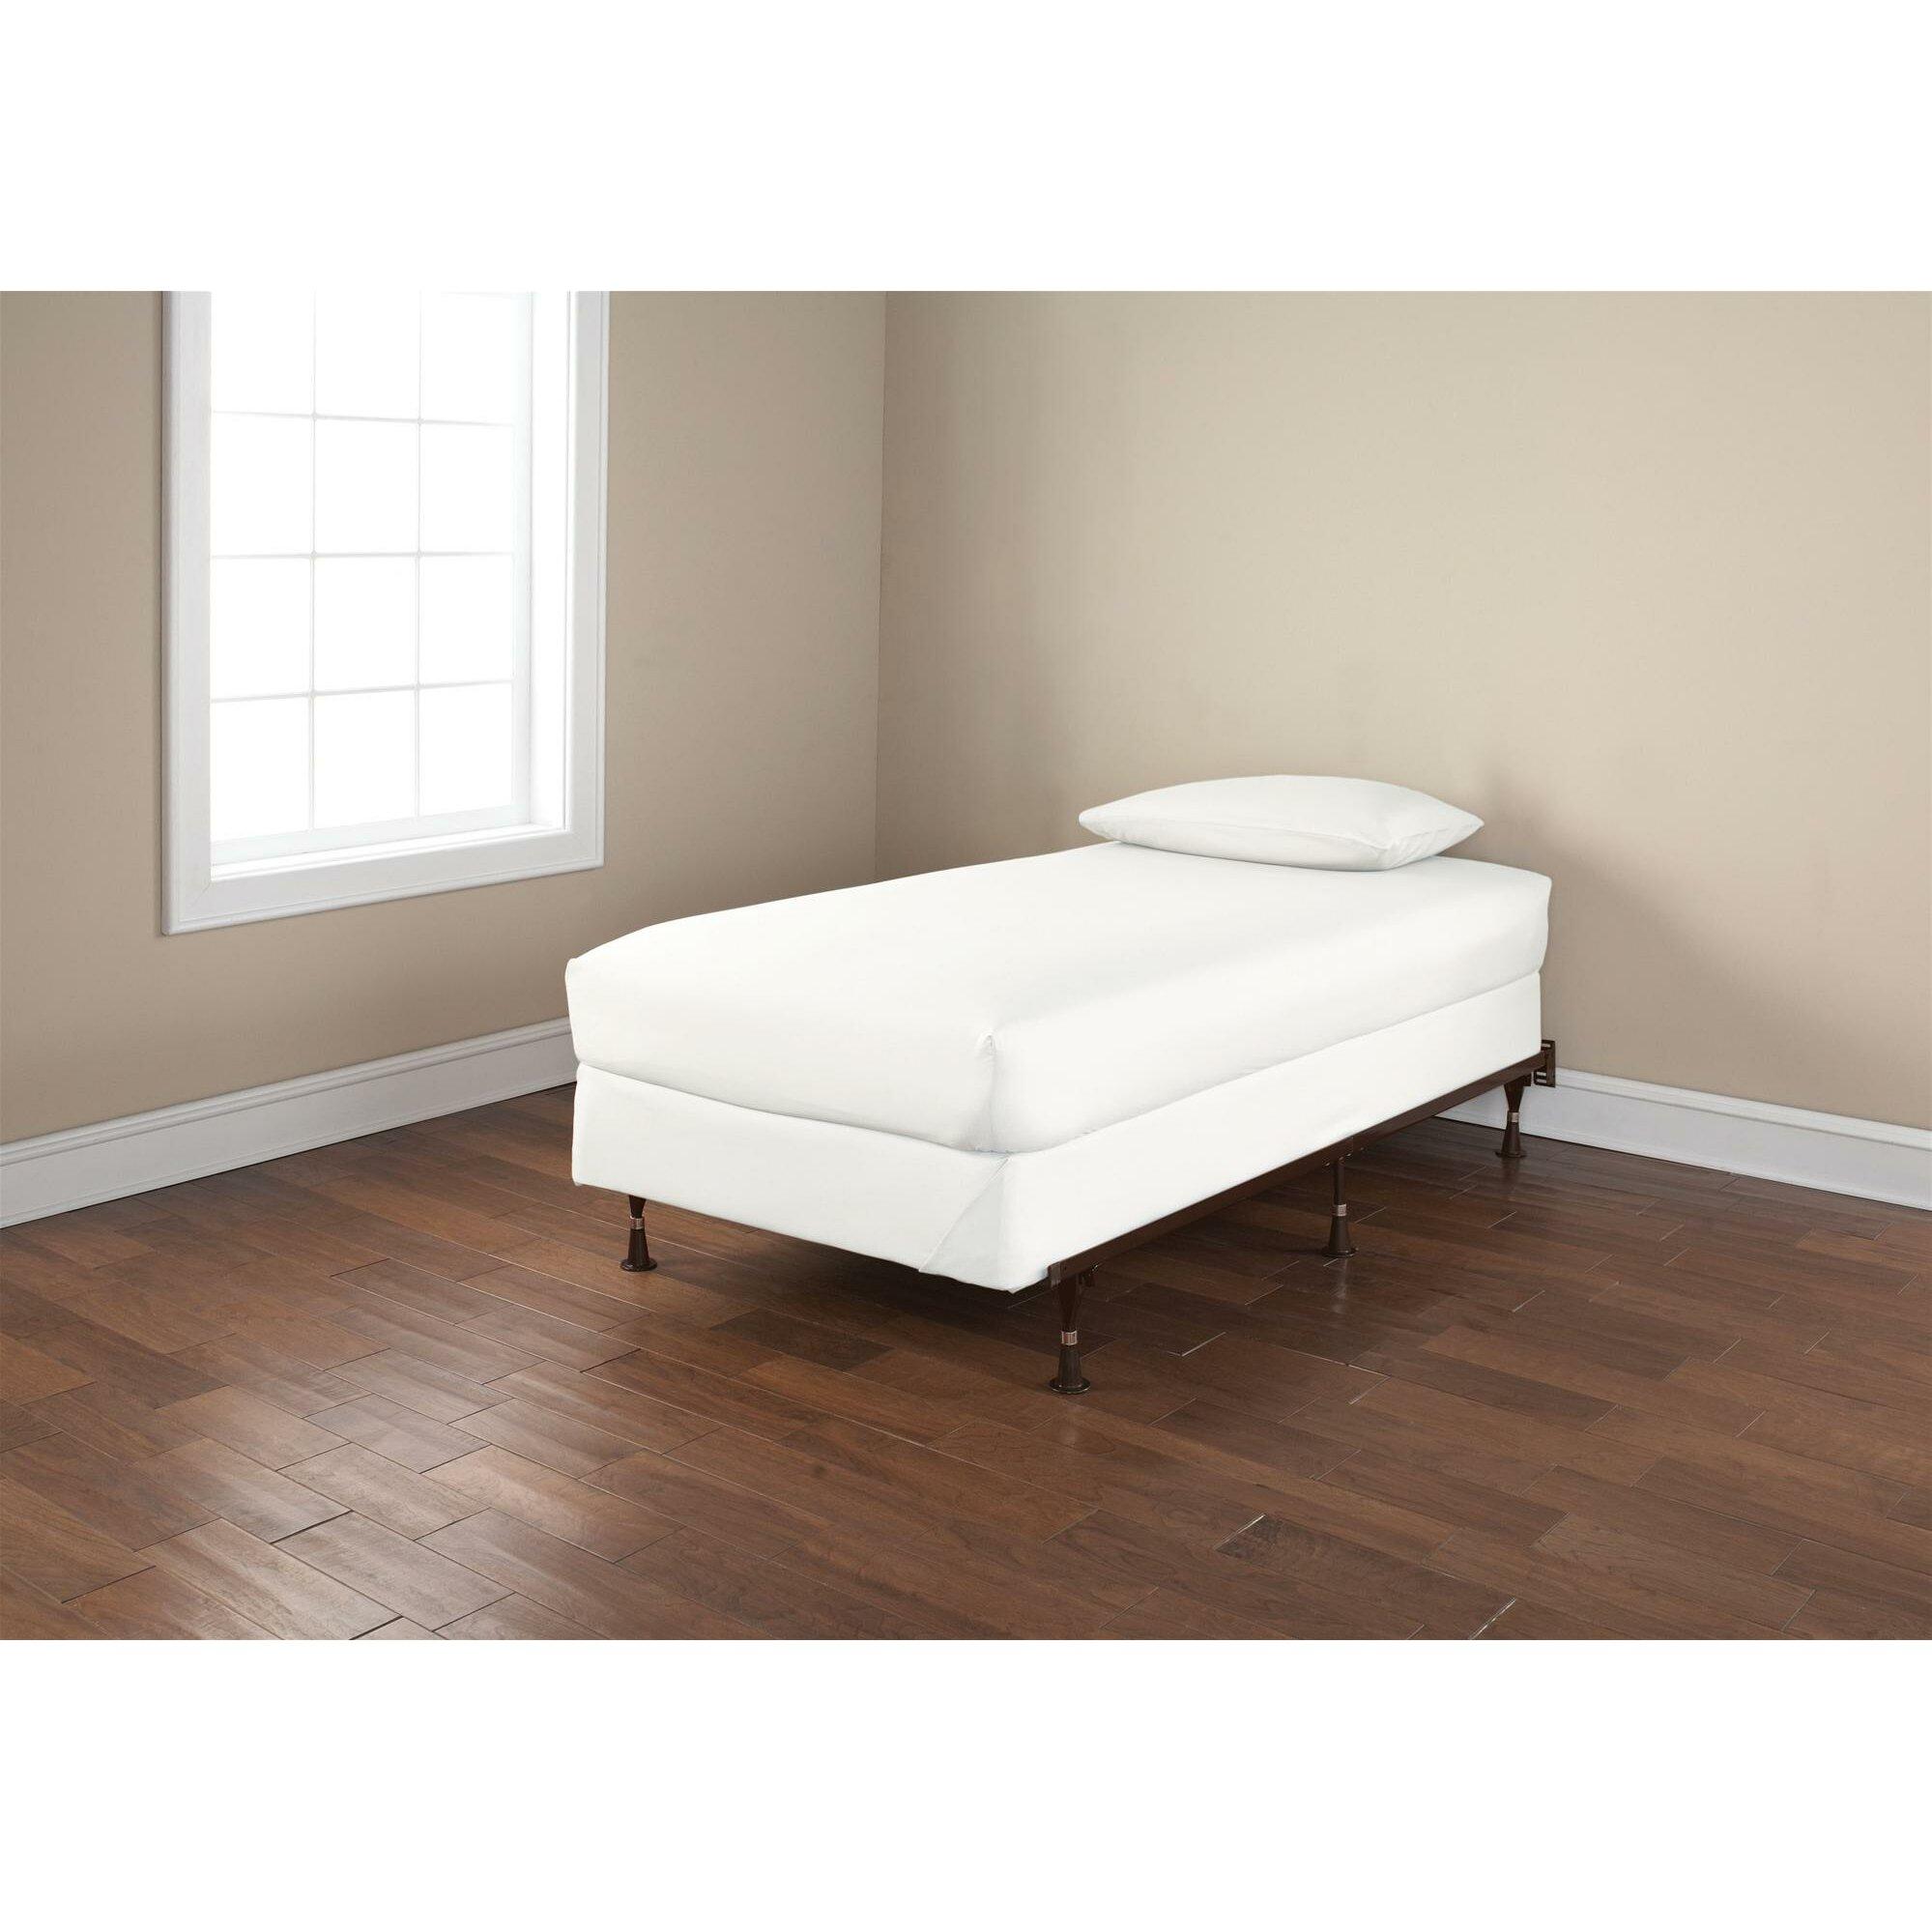 signature sleep universal bed frame